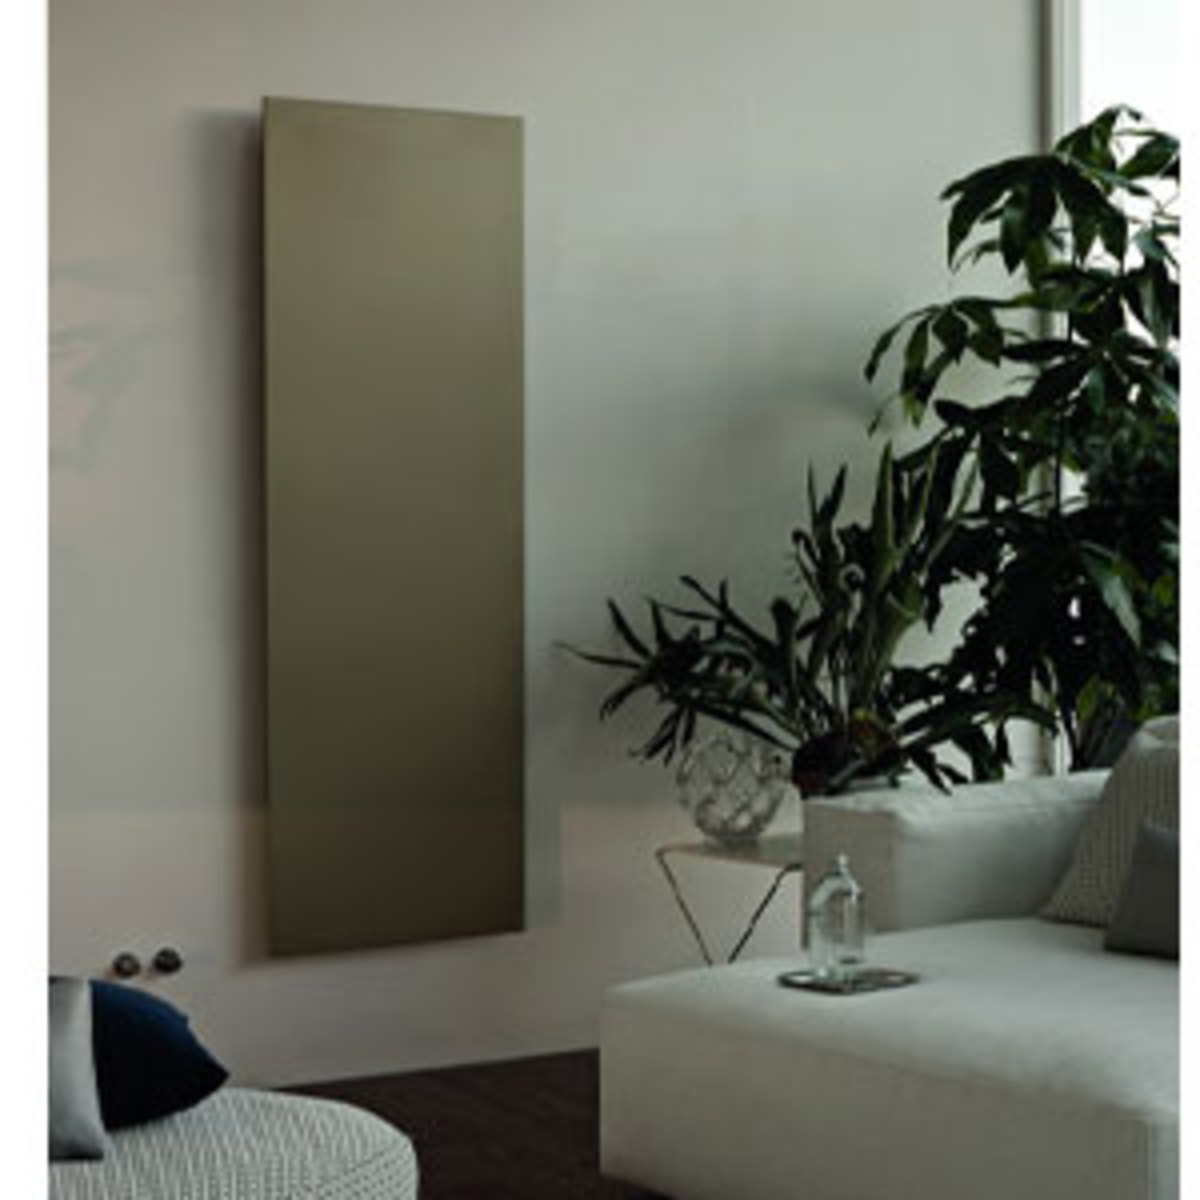 heizkoerper square ludovica roberto palomba kollektion elements tubes floornature. Black Bedroom Furniture Sets. Home Design Ideas